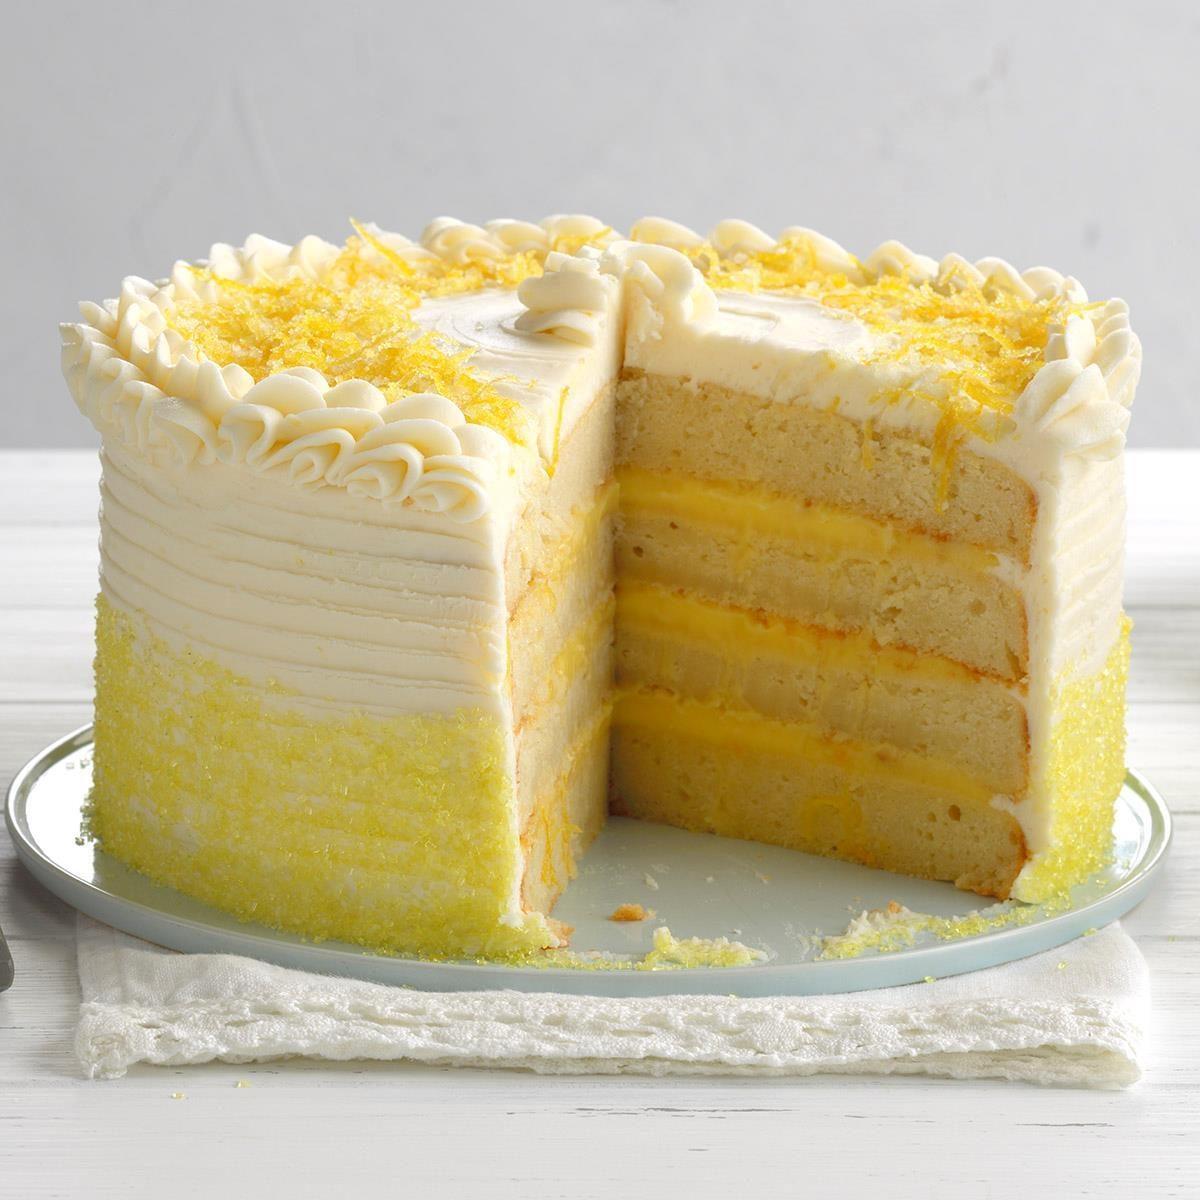 Cool Lemon Ricotta Cake Recipe Taste Of Home Funny Birthday Cards Online Inifodamsfinfo